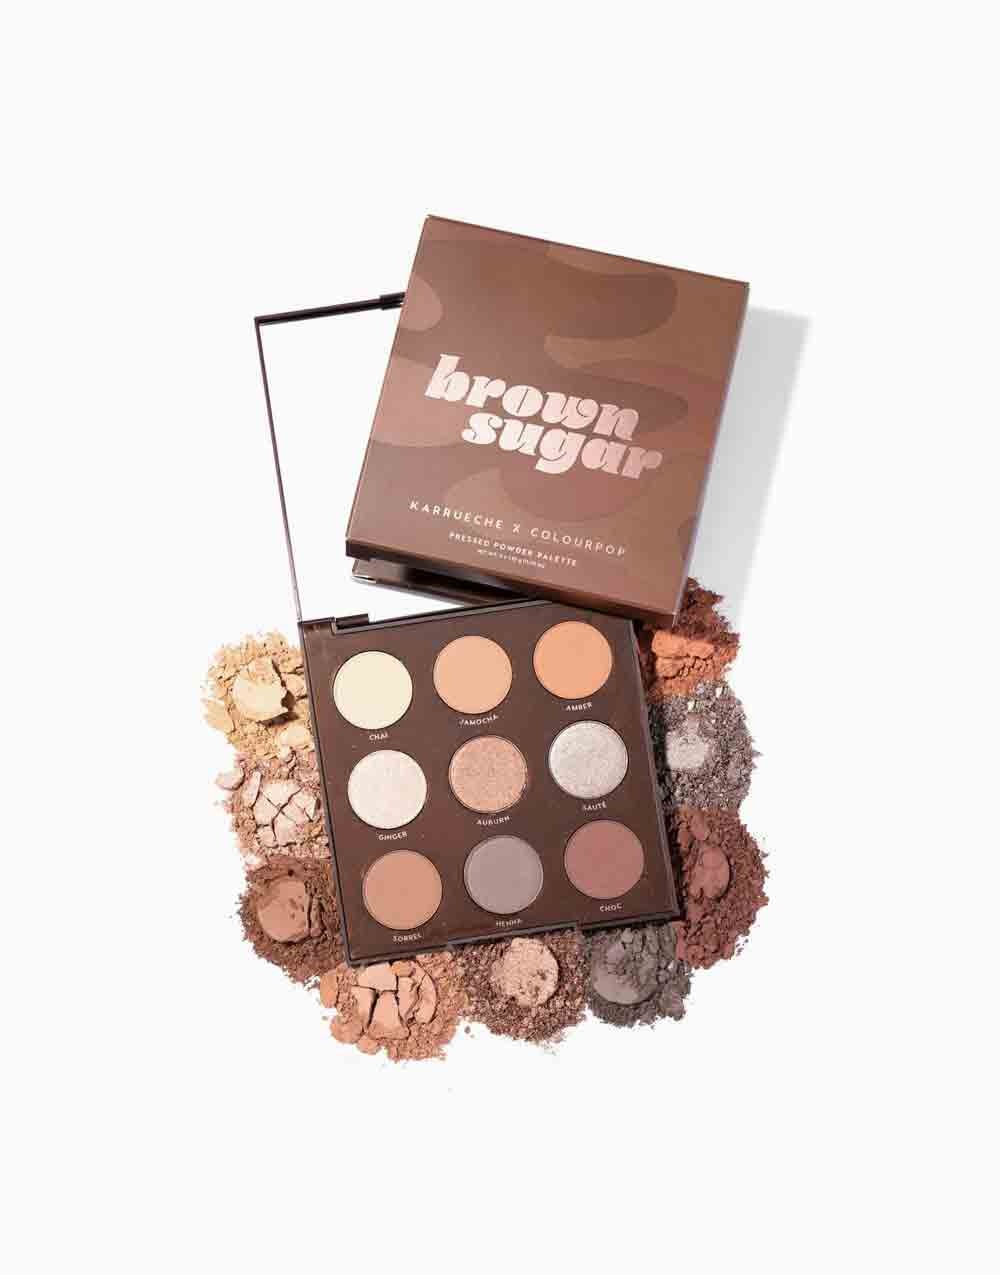 Brown Sugar Pressed Powder Shadow Palette by ColourPop